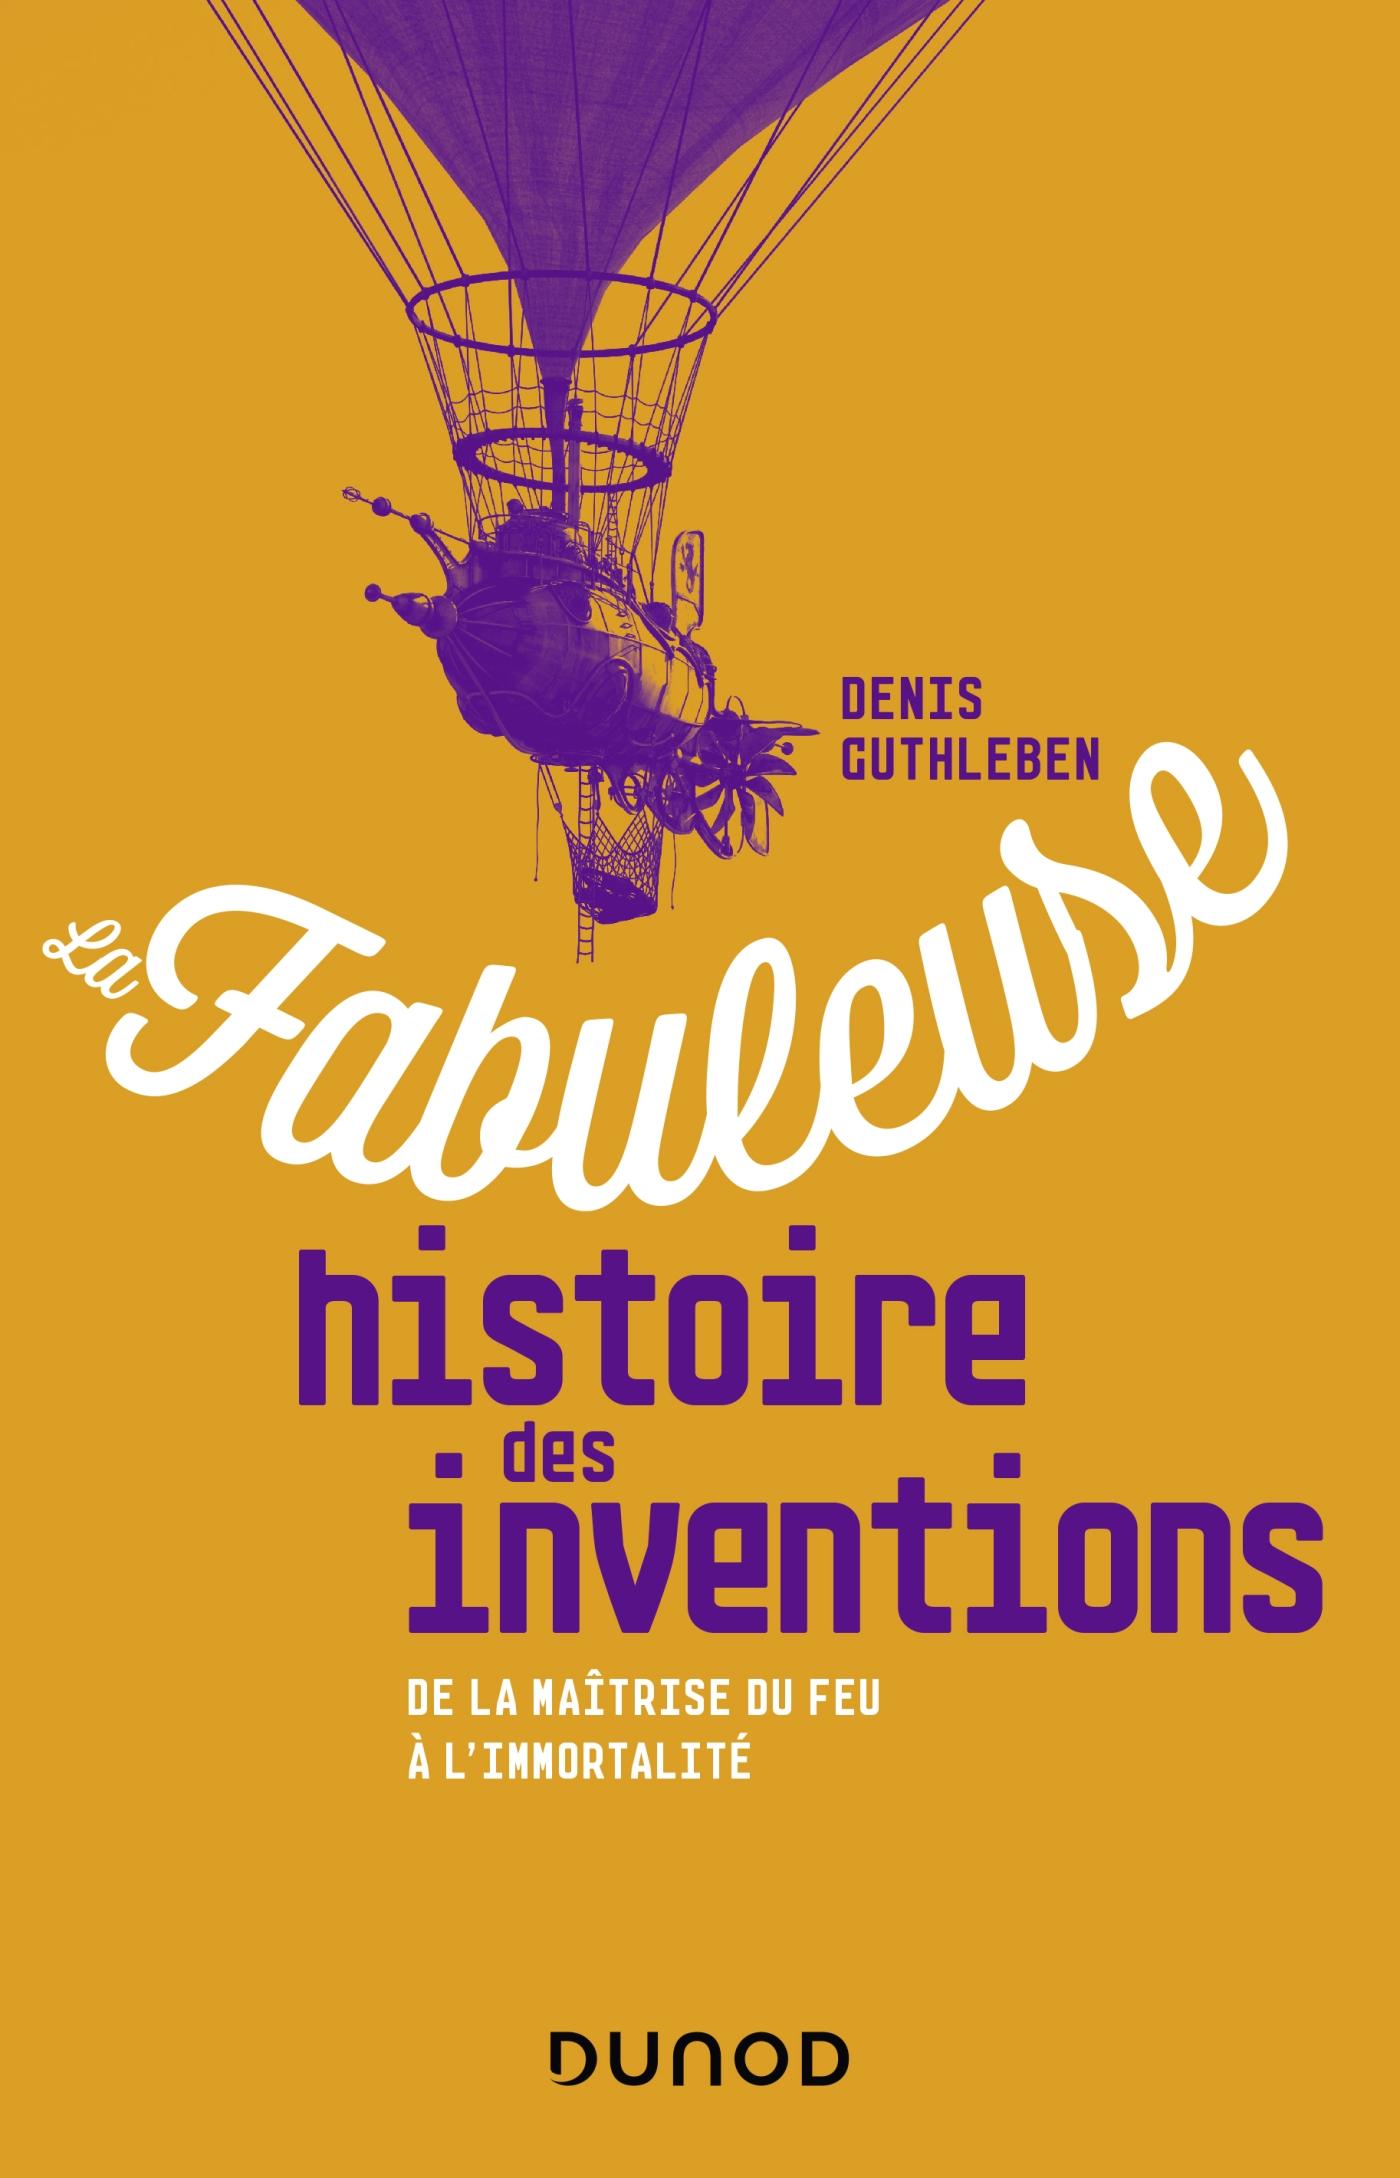 La fabuleuse histoire des inventions |